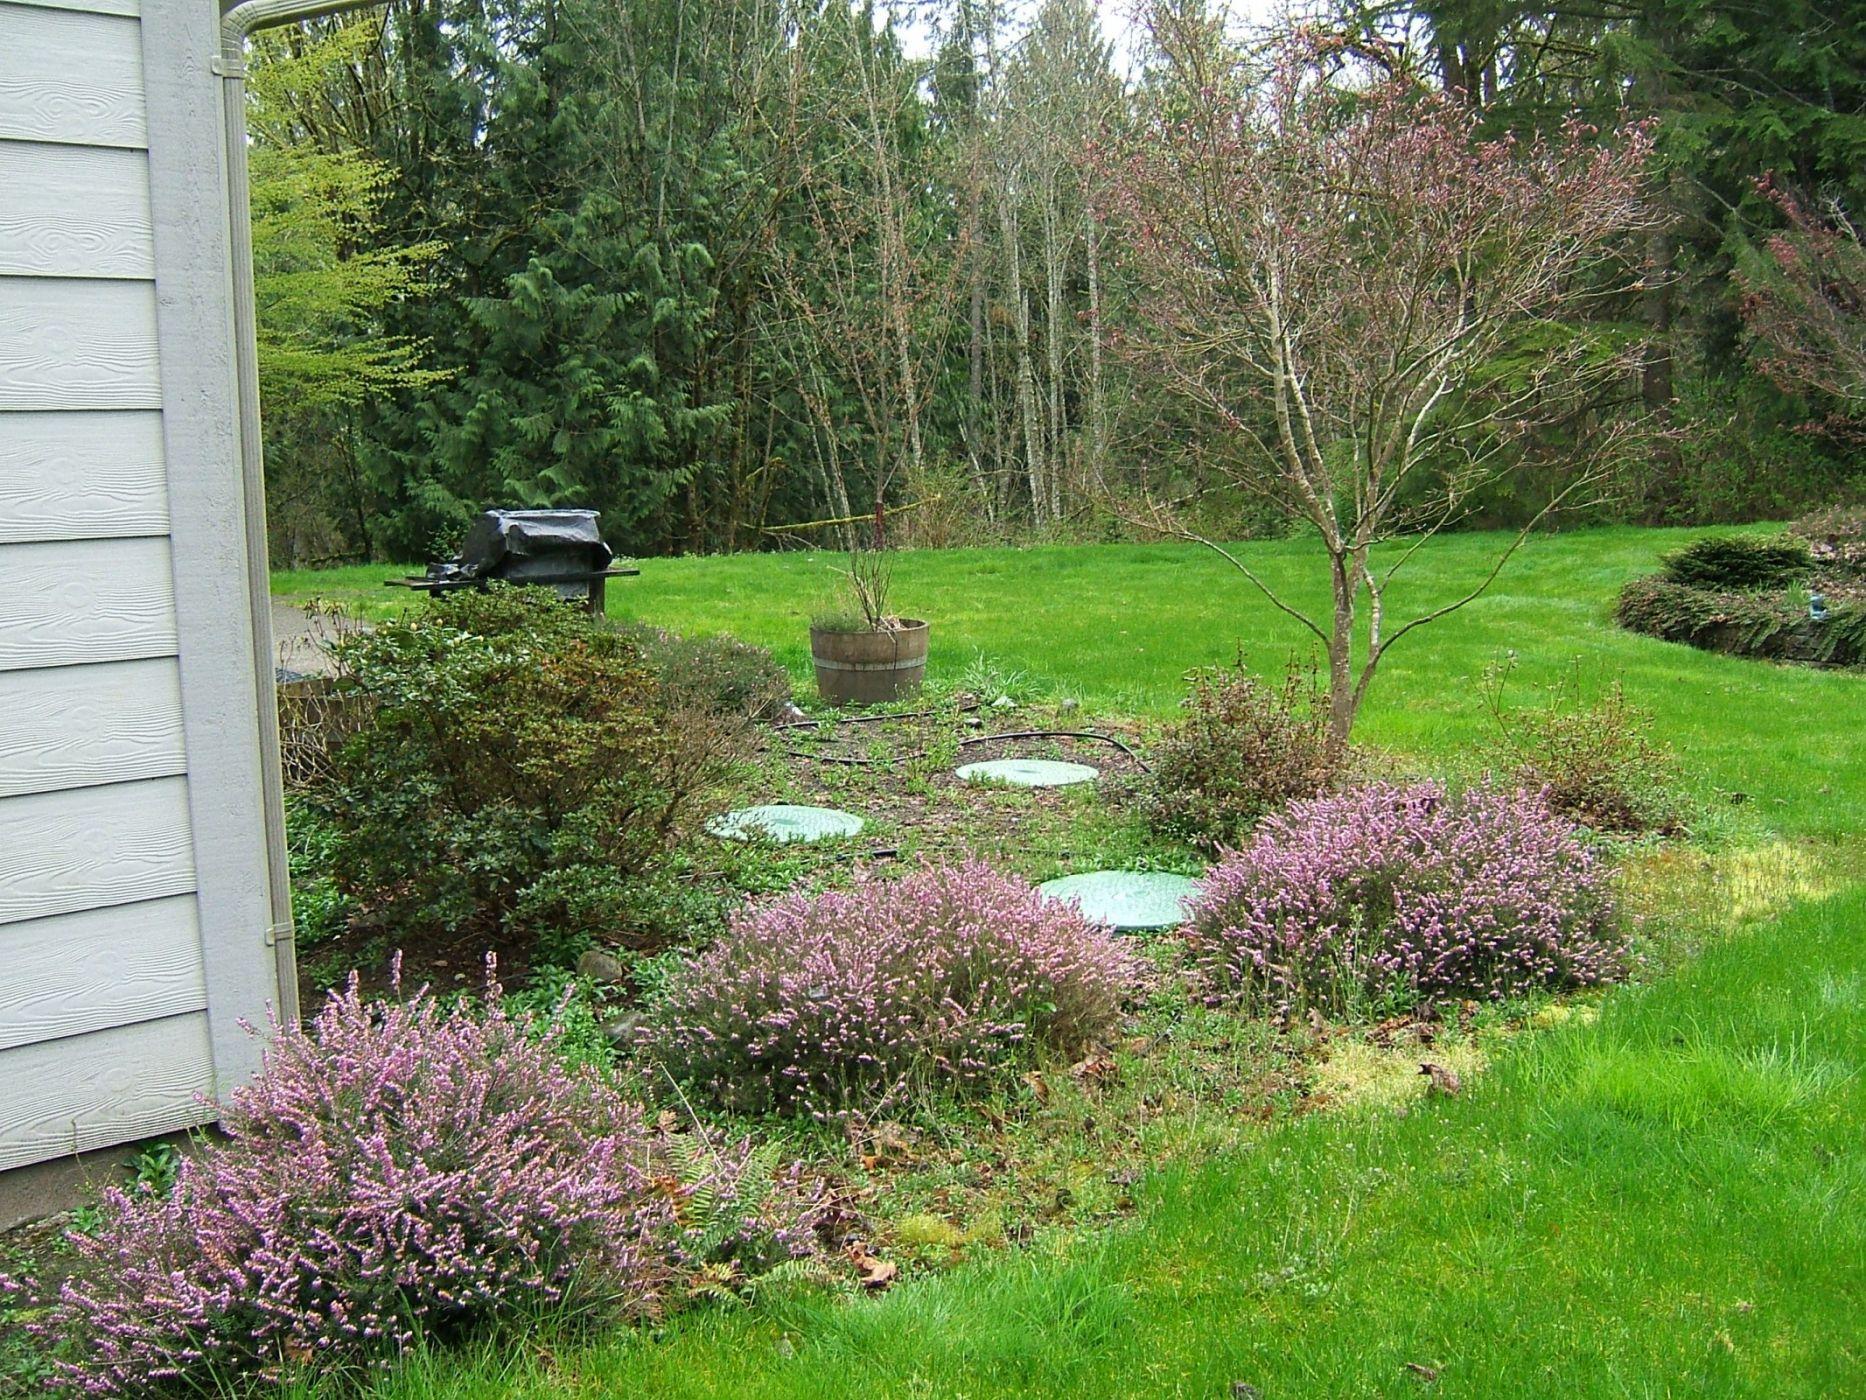 Landscaping Over A Septic Tank : Septic lids sublime garden design landscape